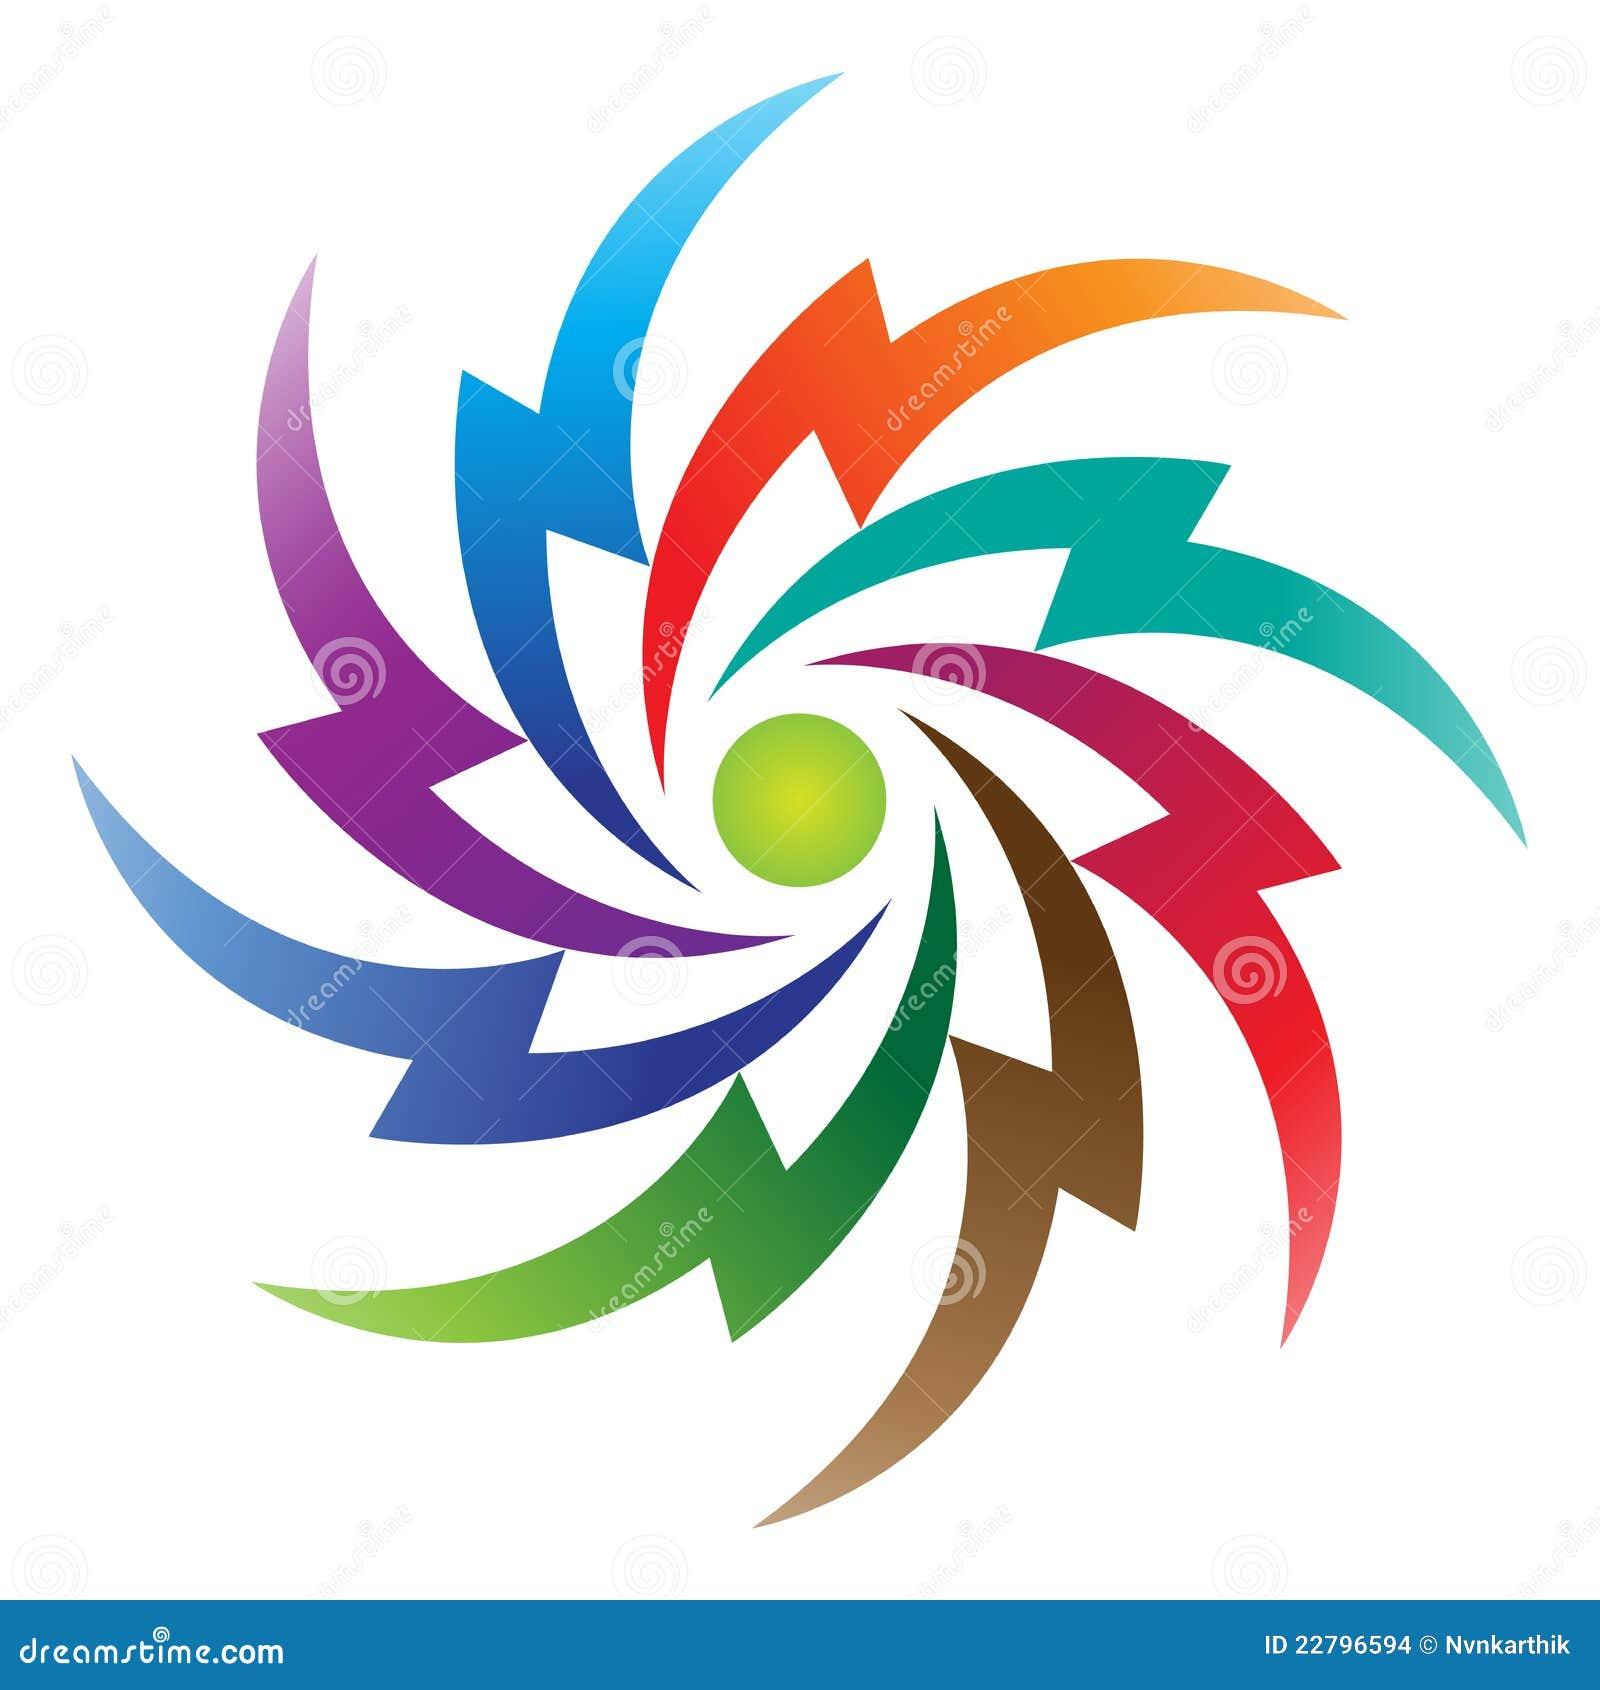 power logo stock images image 22796594